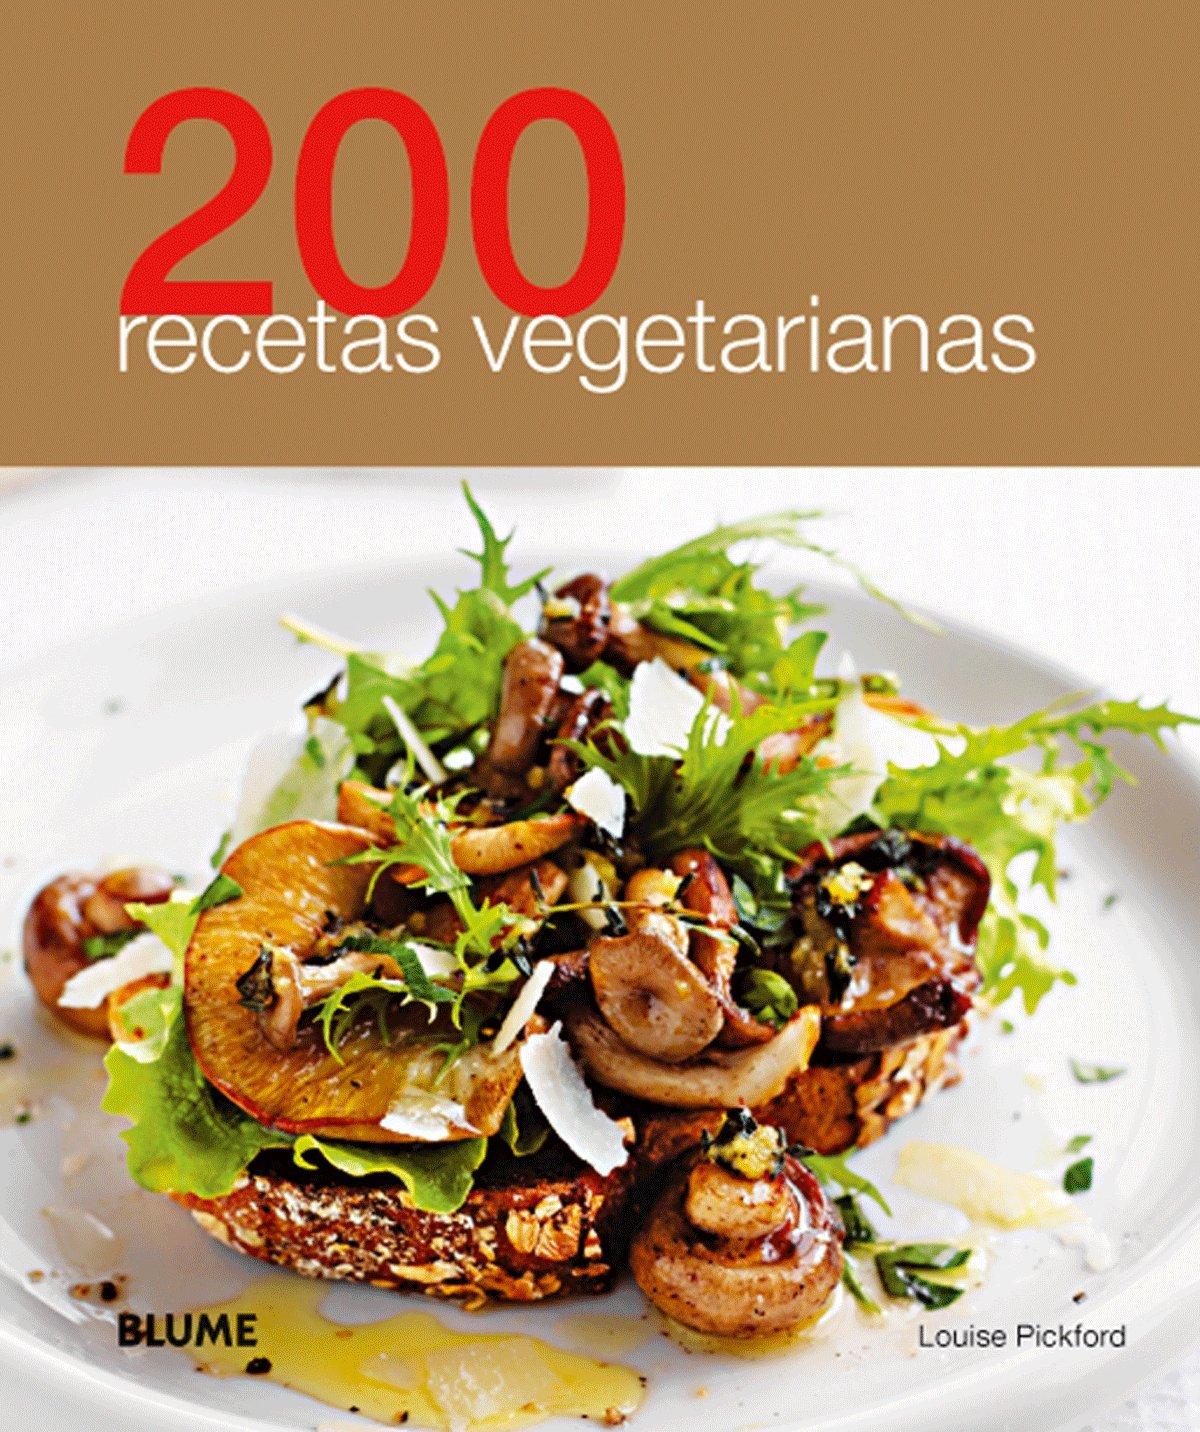 200 recetas vegetarianas (Spanish Edition): Louise Pickford: 9788480769570:  Amazon.com: Books